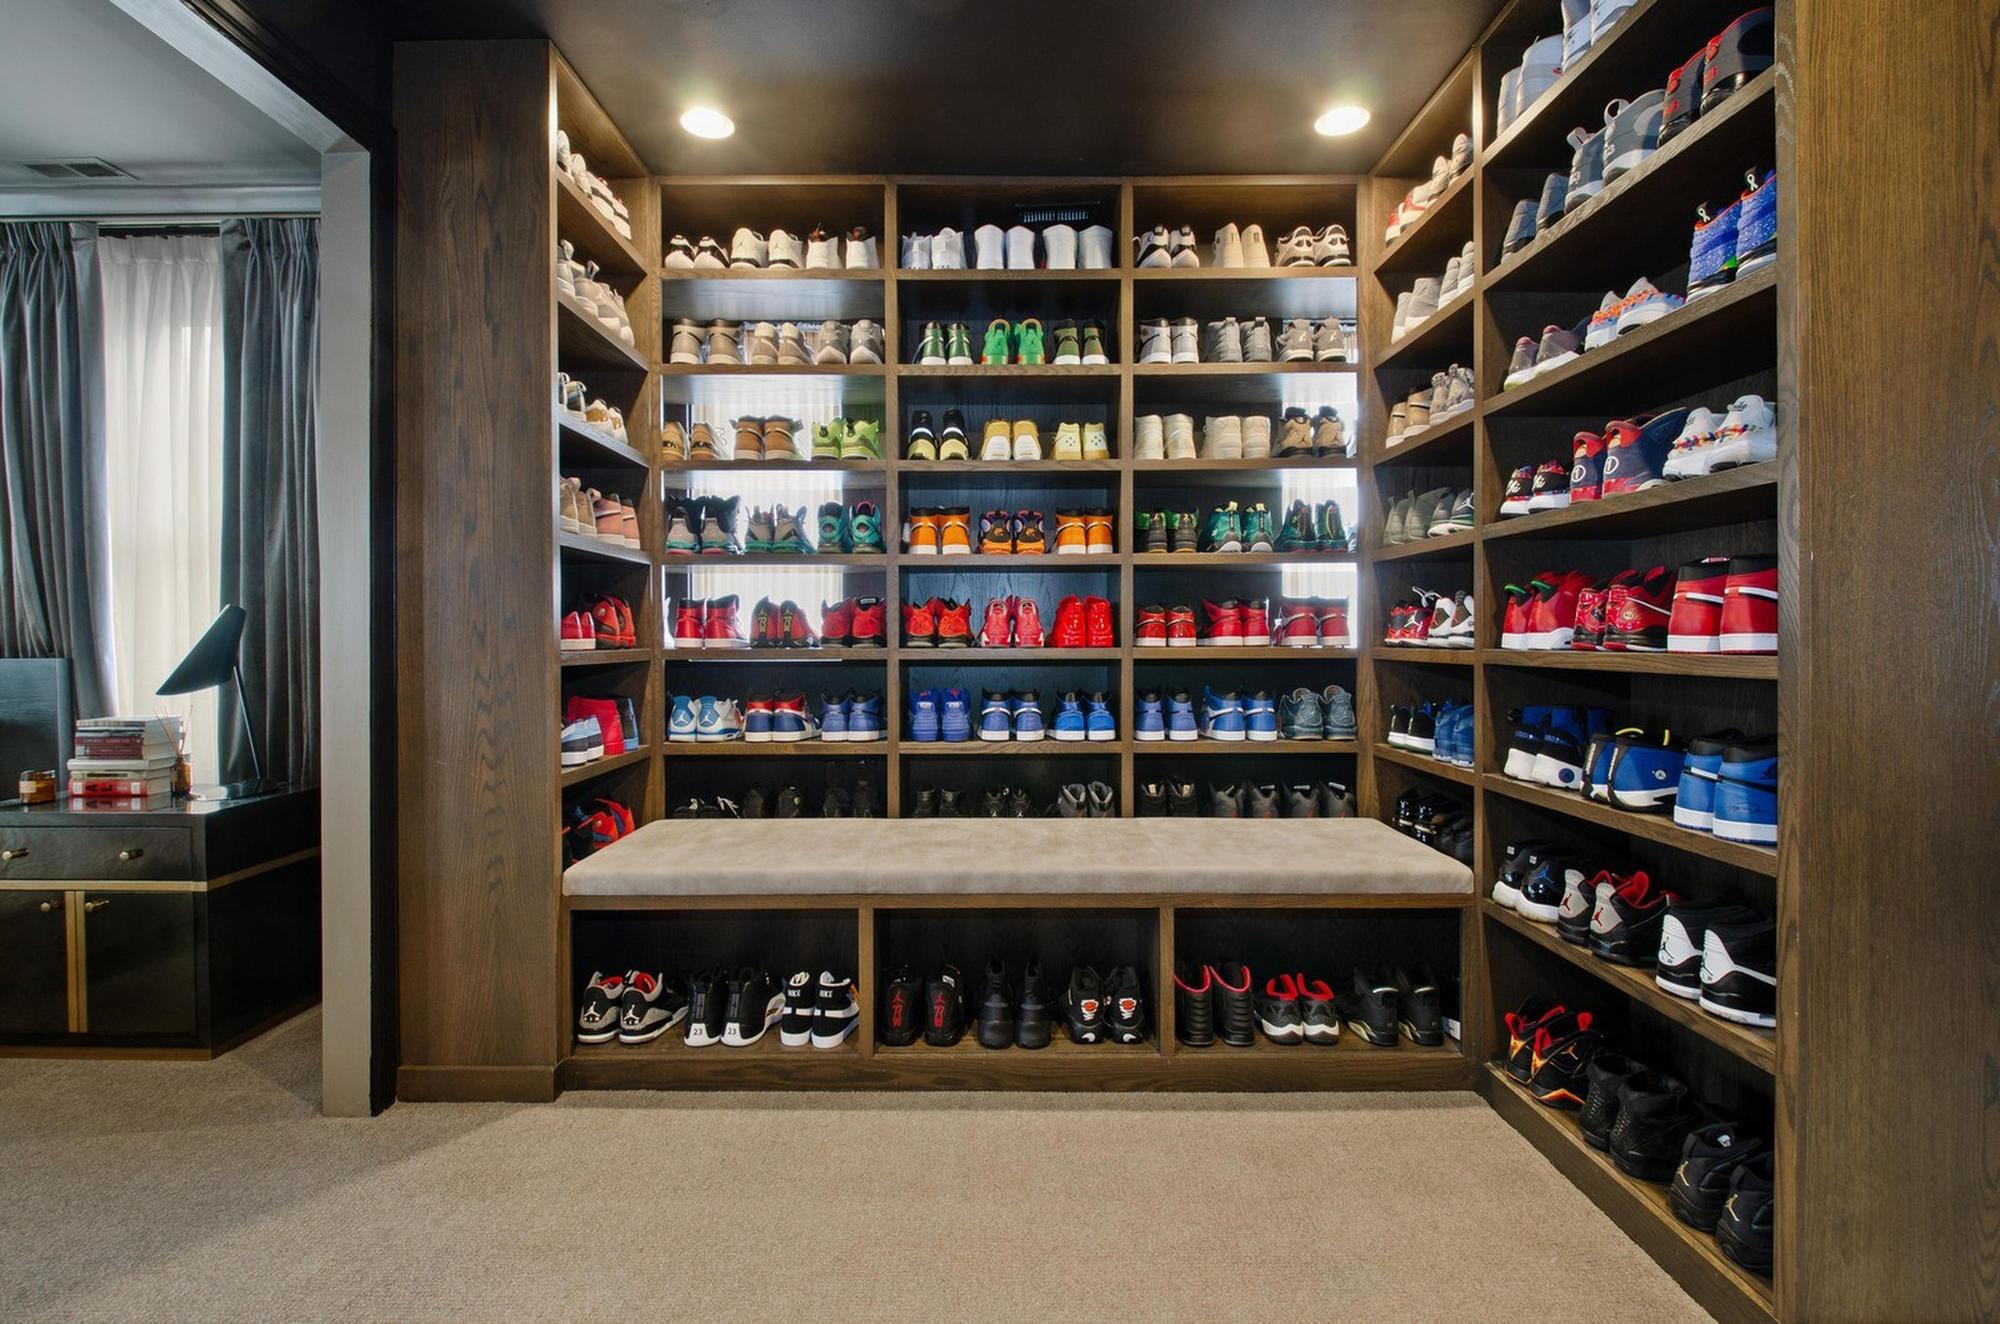 48fb81e35609 With closet full of Air Jordans